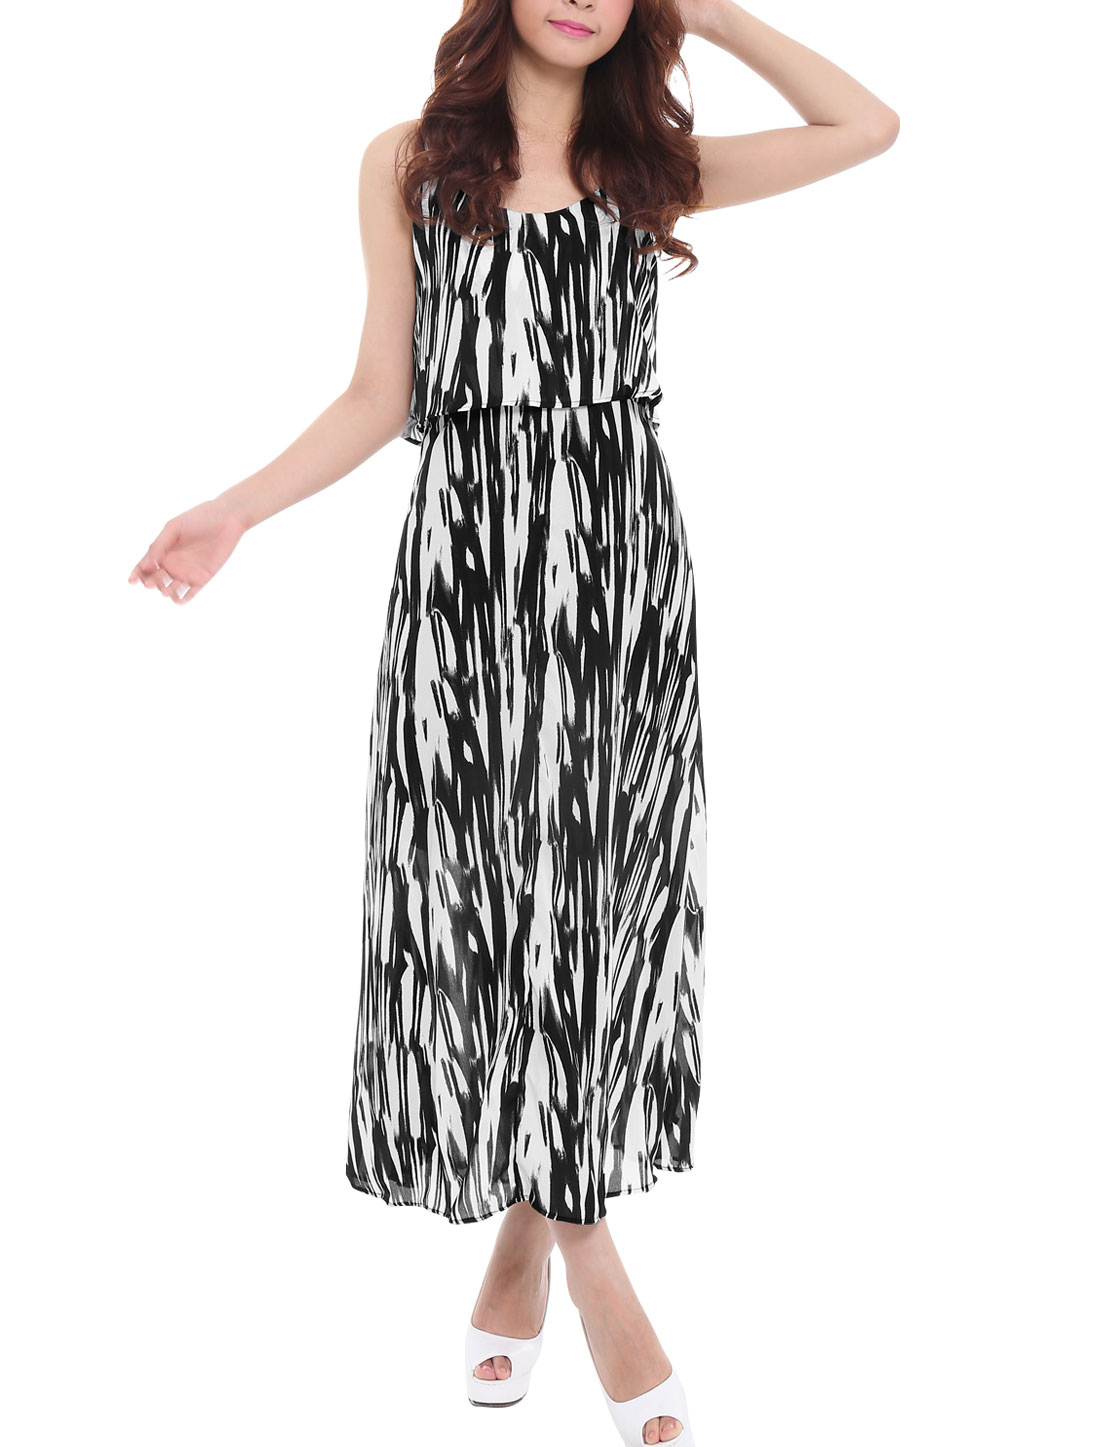 Lady Spaghetti Strap Elastic Waist Allover Print Ruffle Chiffon Dress Black XS